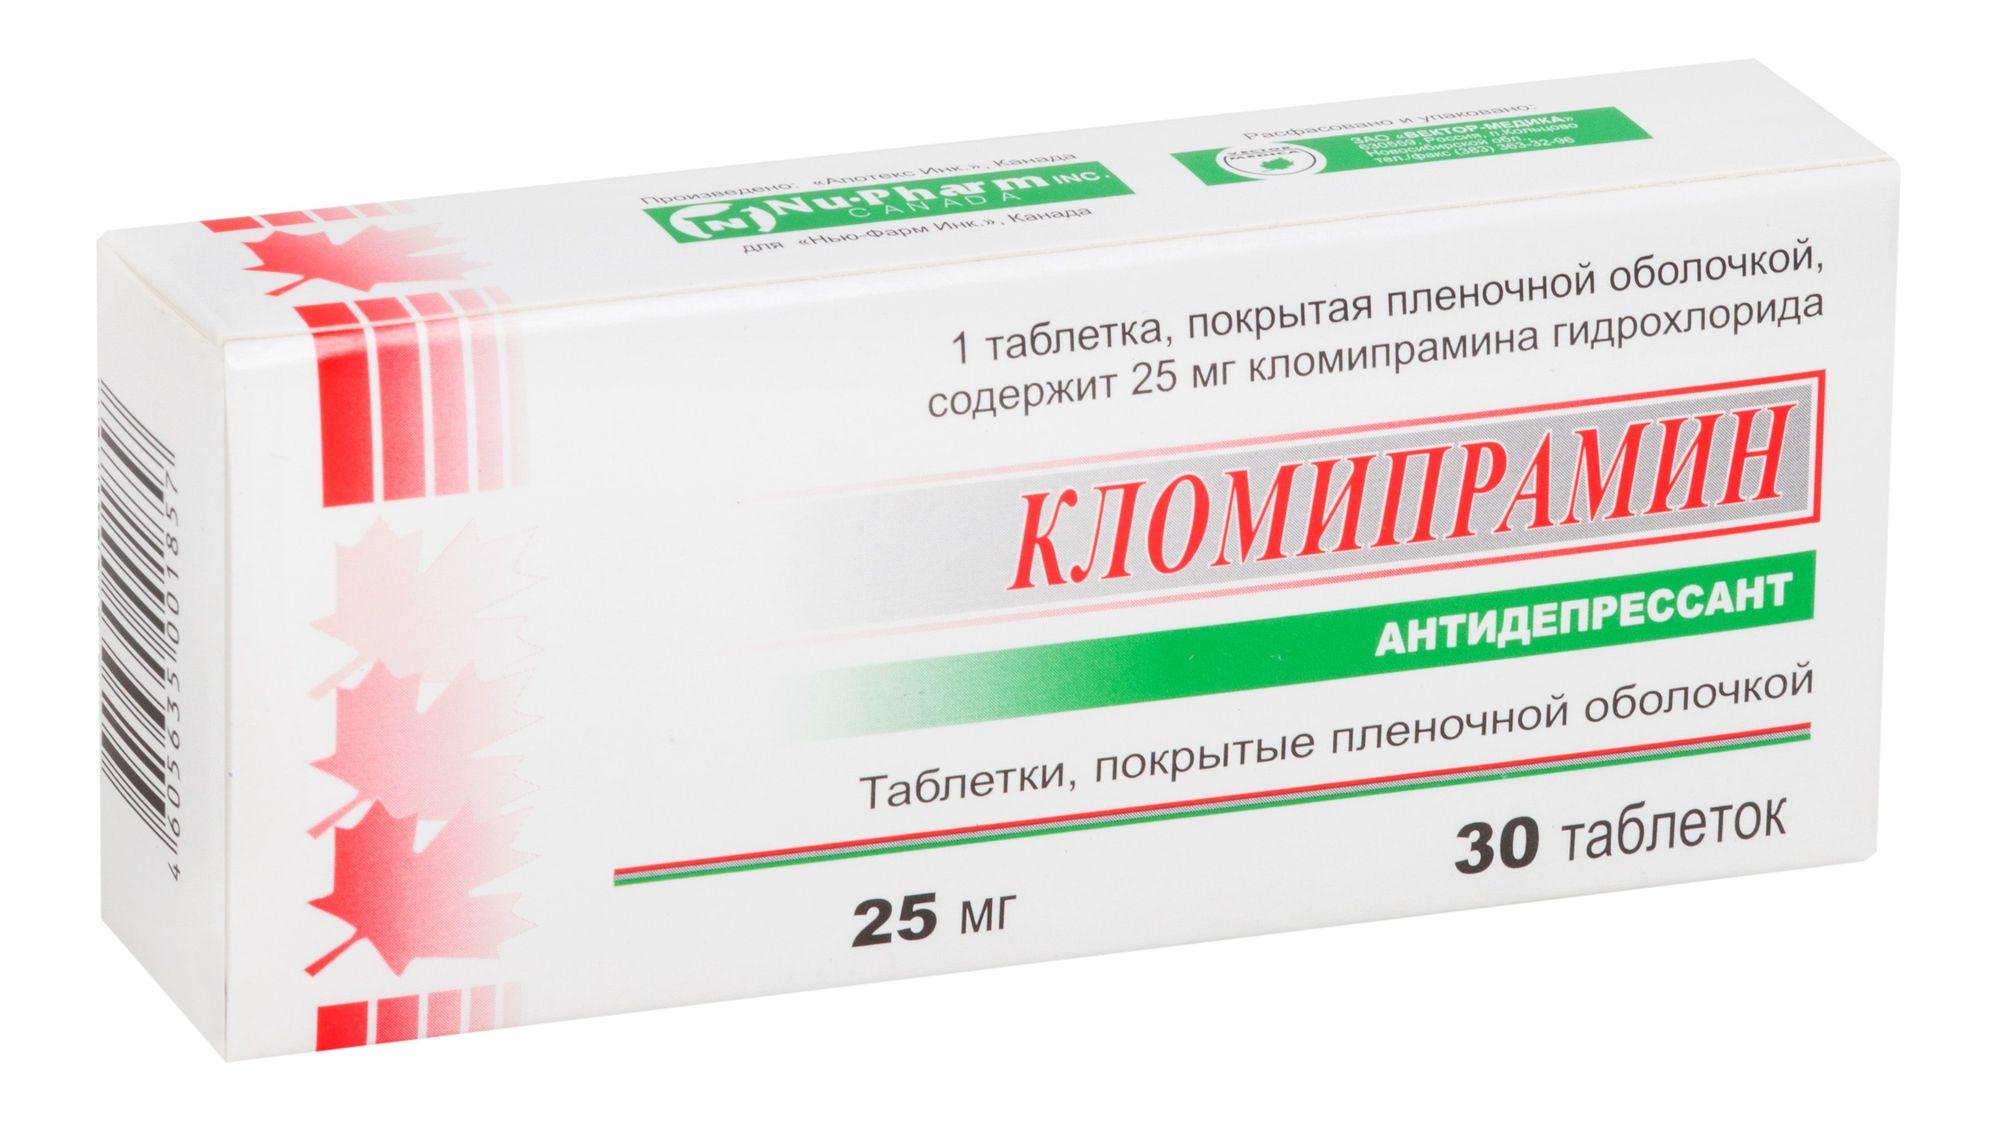 фото упаковки Кломипрамин